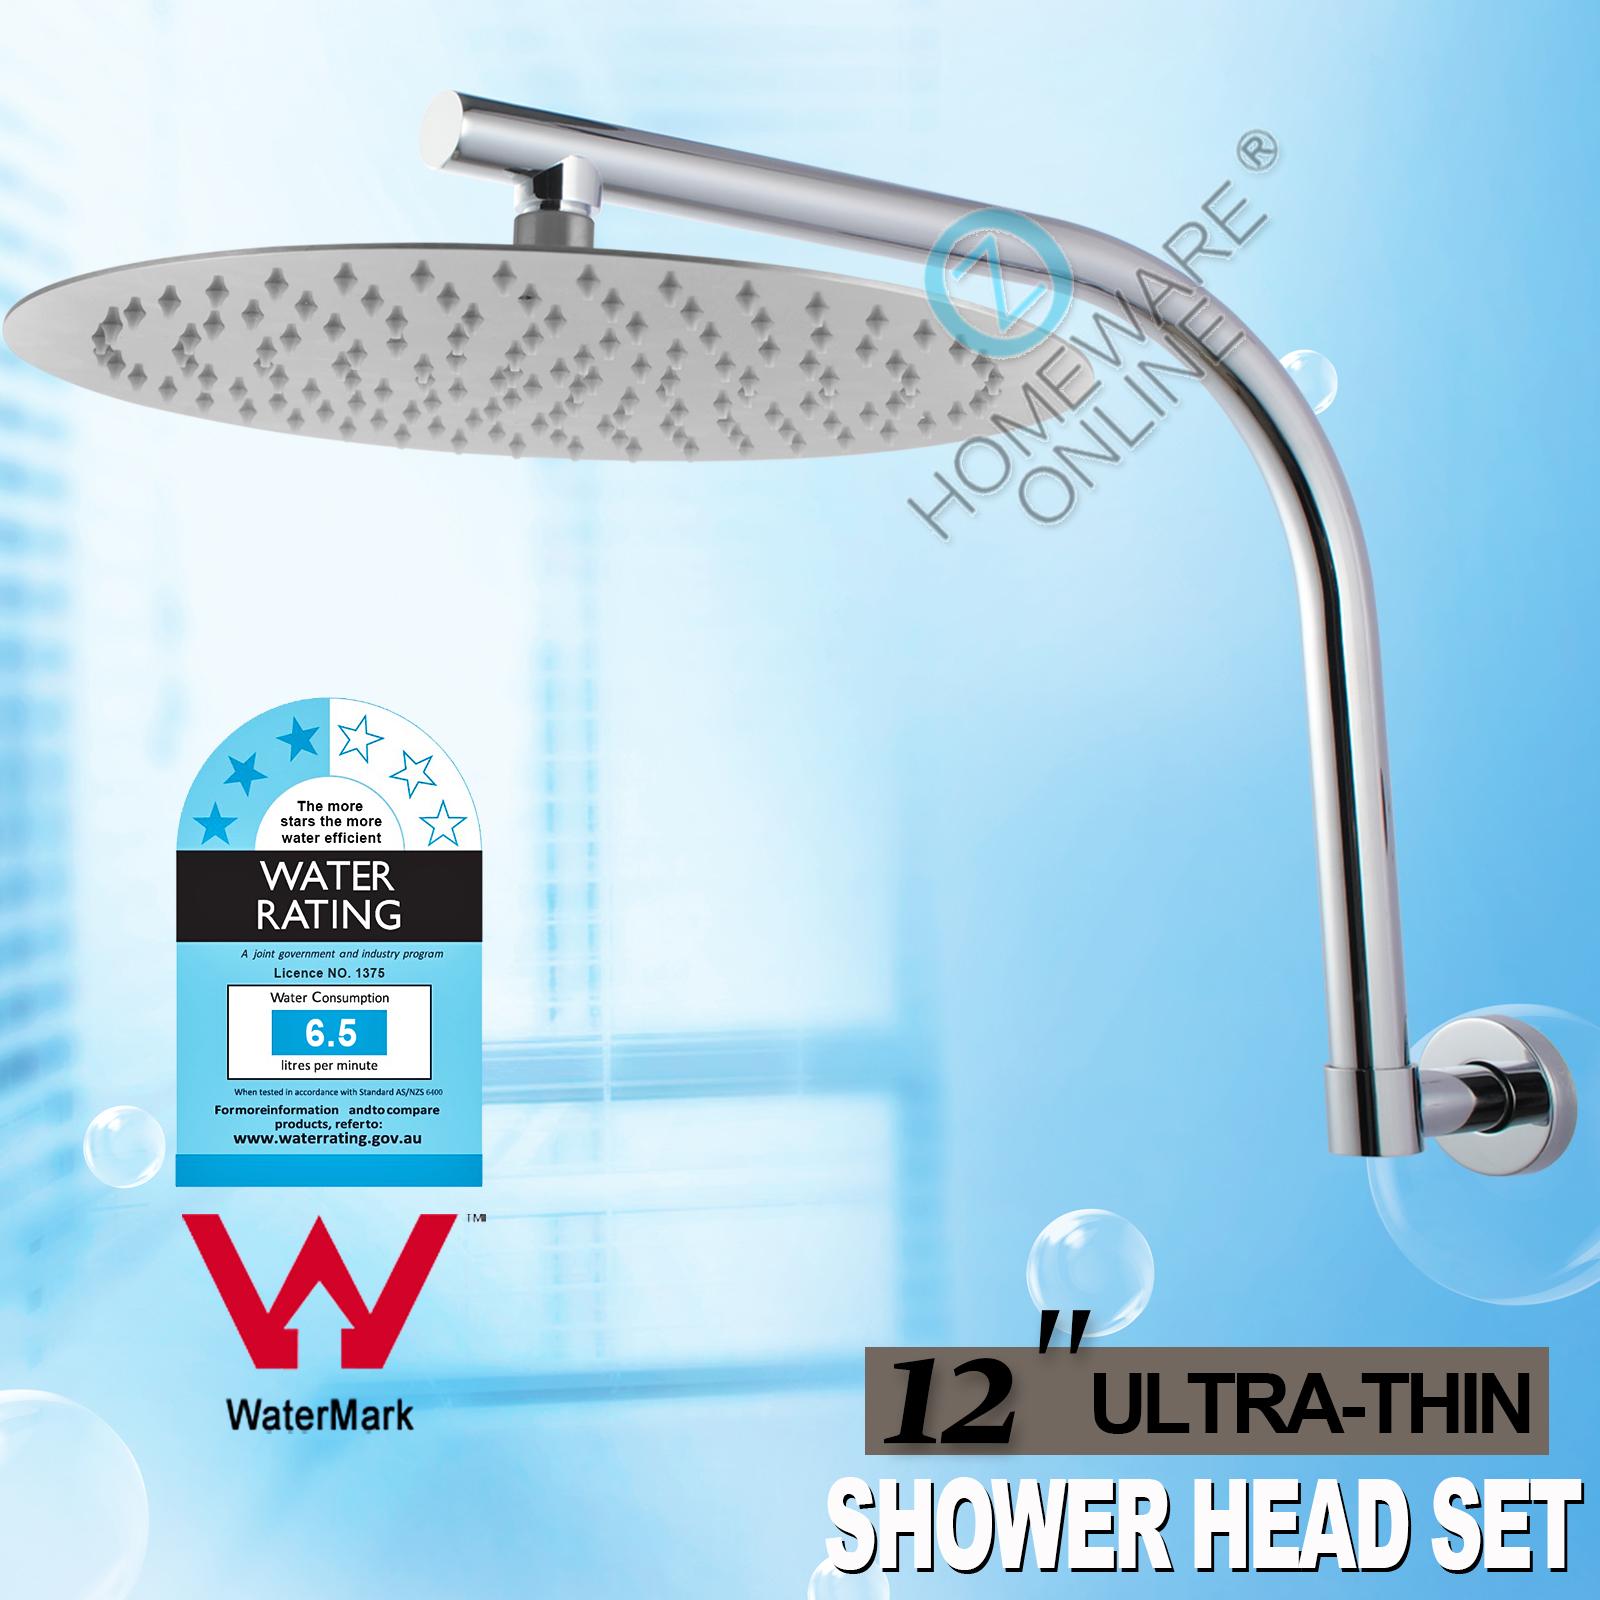 Fine Shower Head Set Image - Bathtub Ideas - dilata.info